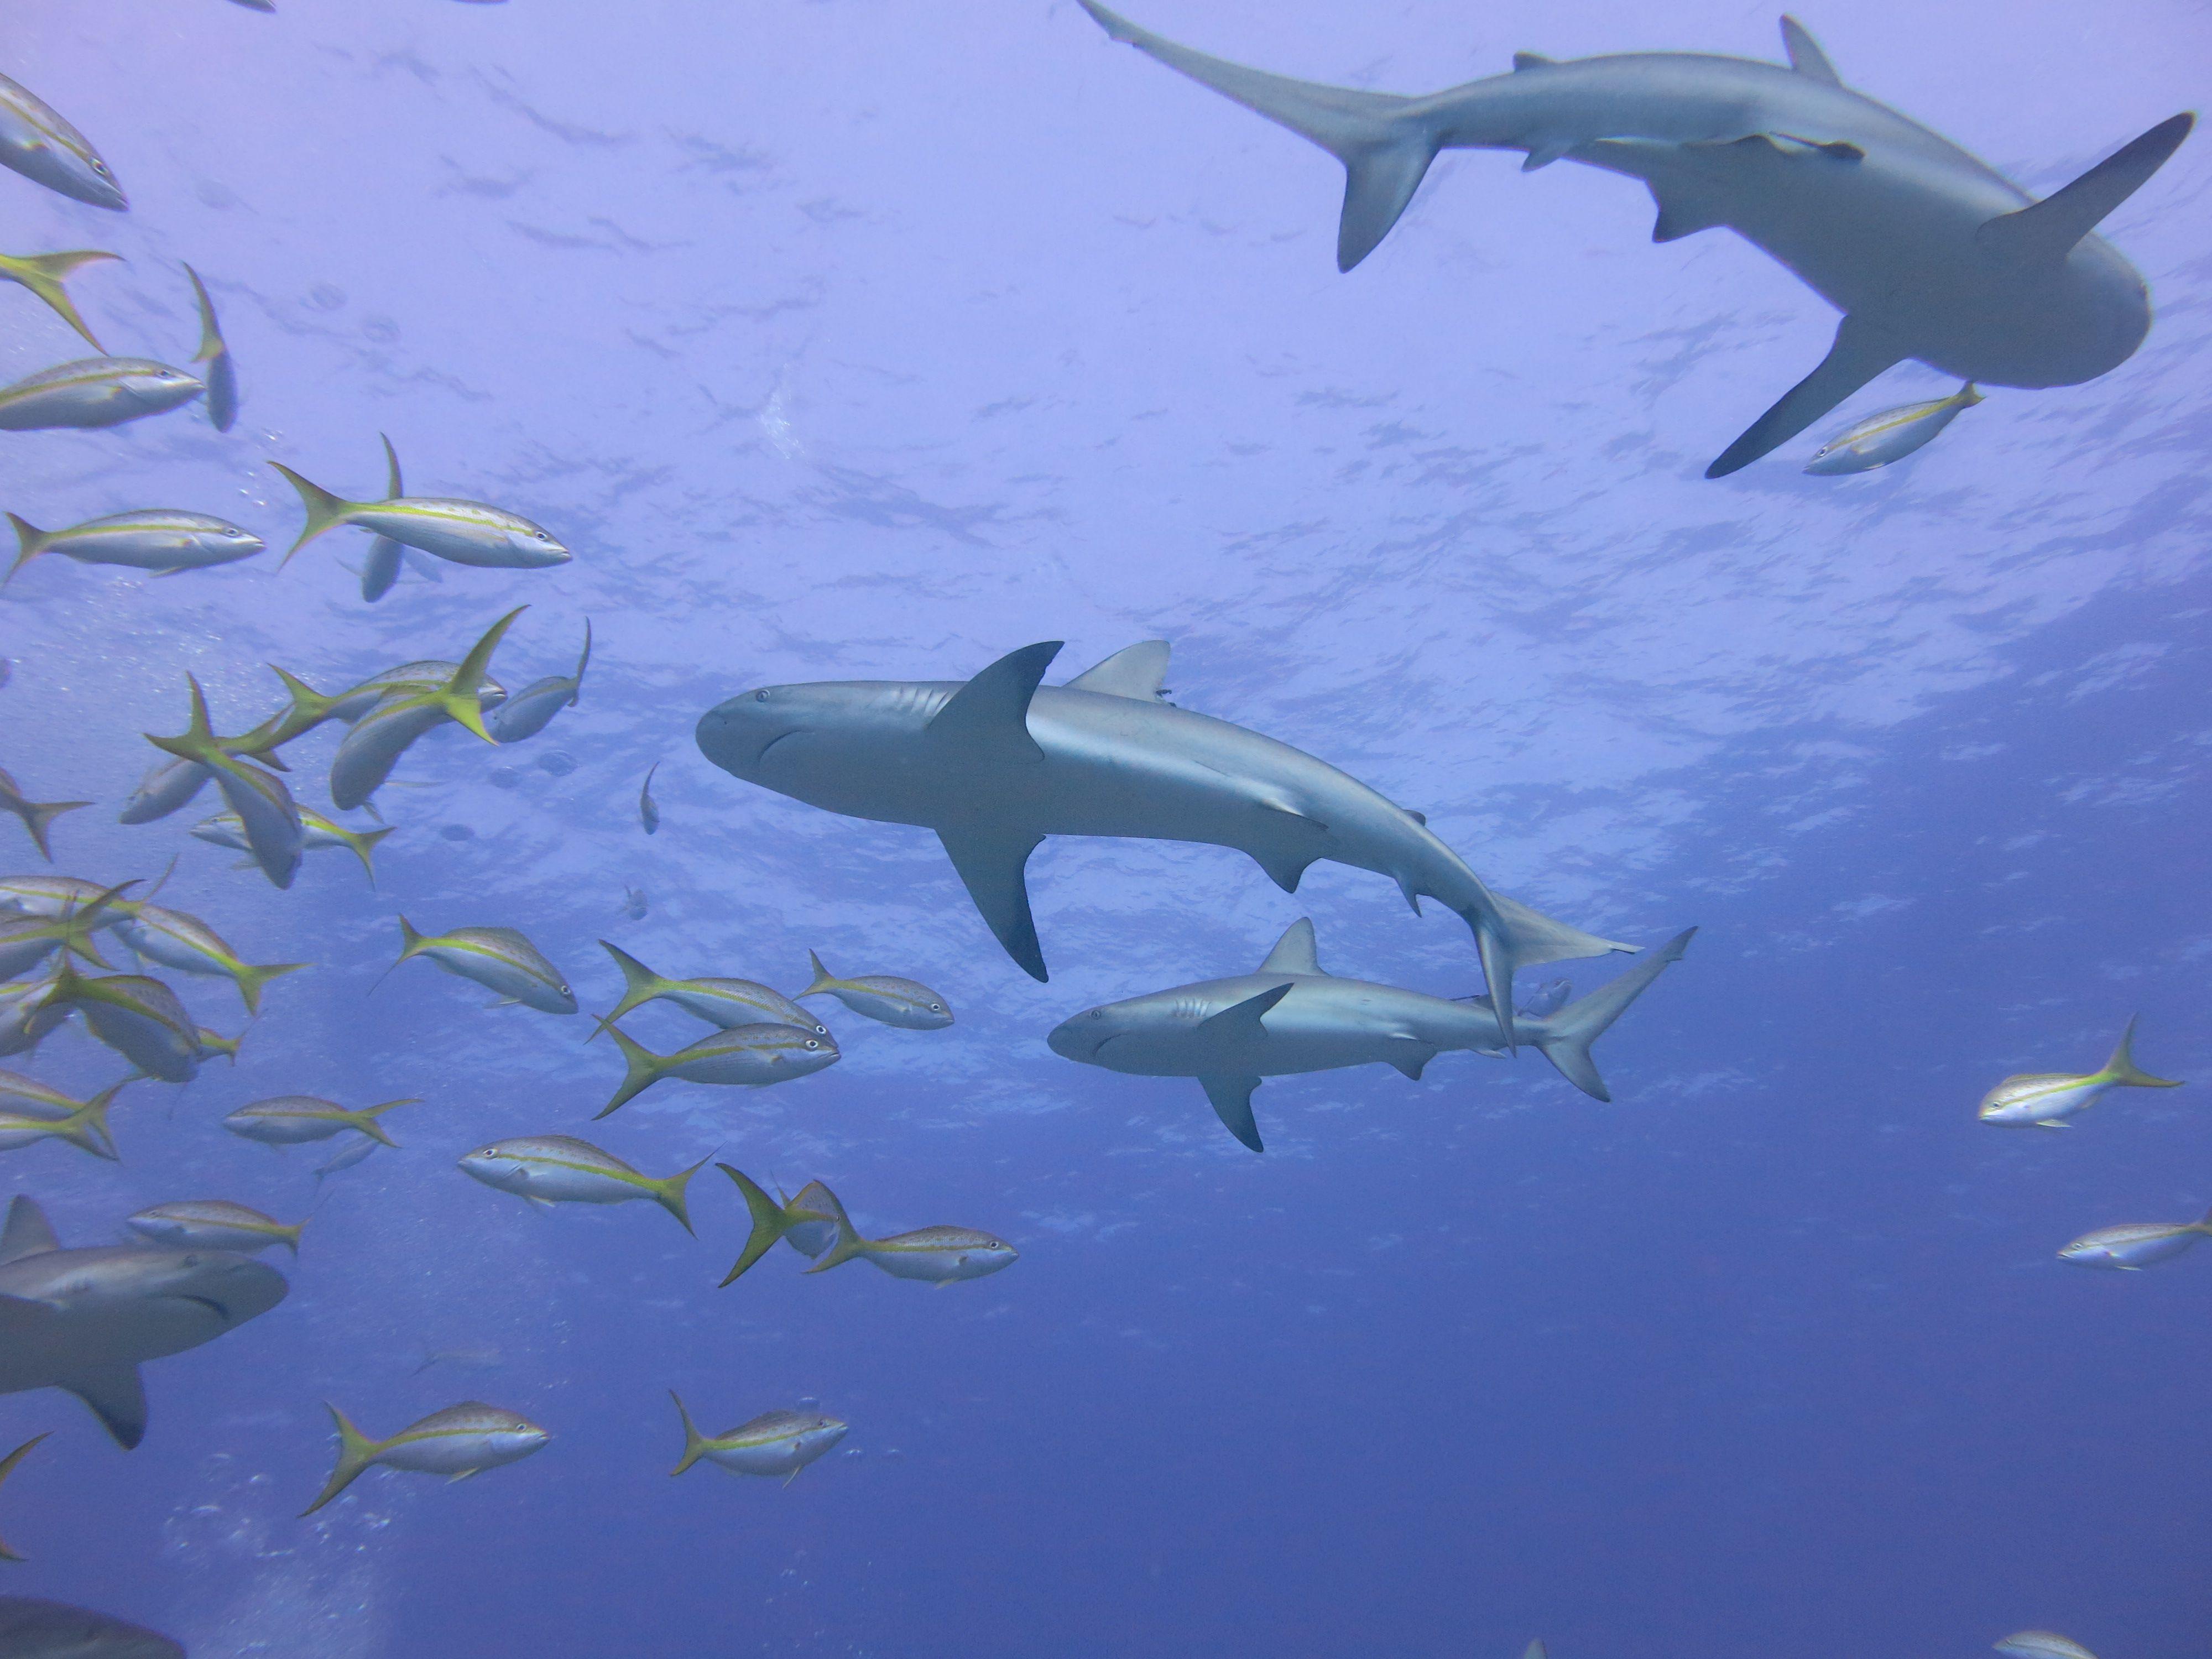 Explore The Beauty Of Caribbean: Sharks #Bahamas #exumas #sharks #blacktip #visitthebahamas